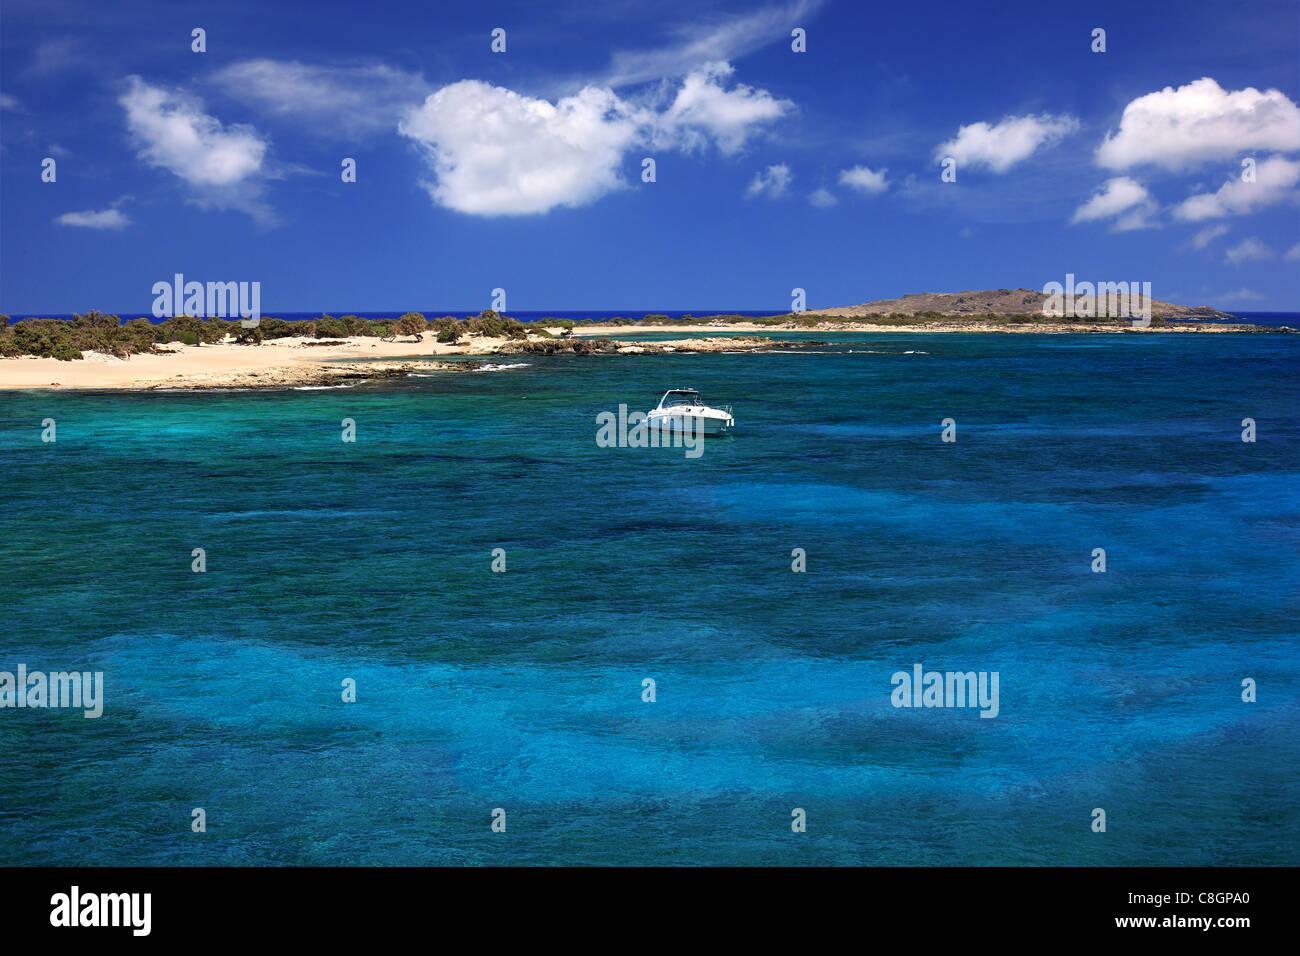 The south coast of Chrissi  island, a small exotic island, a tiny paradise, 8 miles south of  Ierapetra, Lasithi, Stock Photo